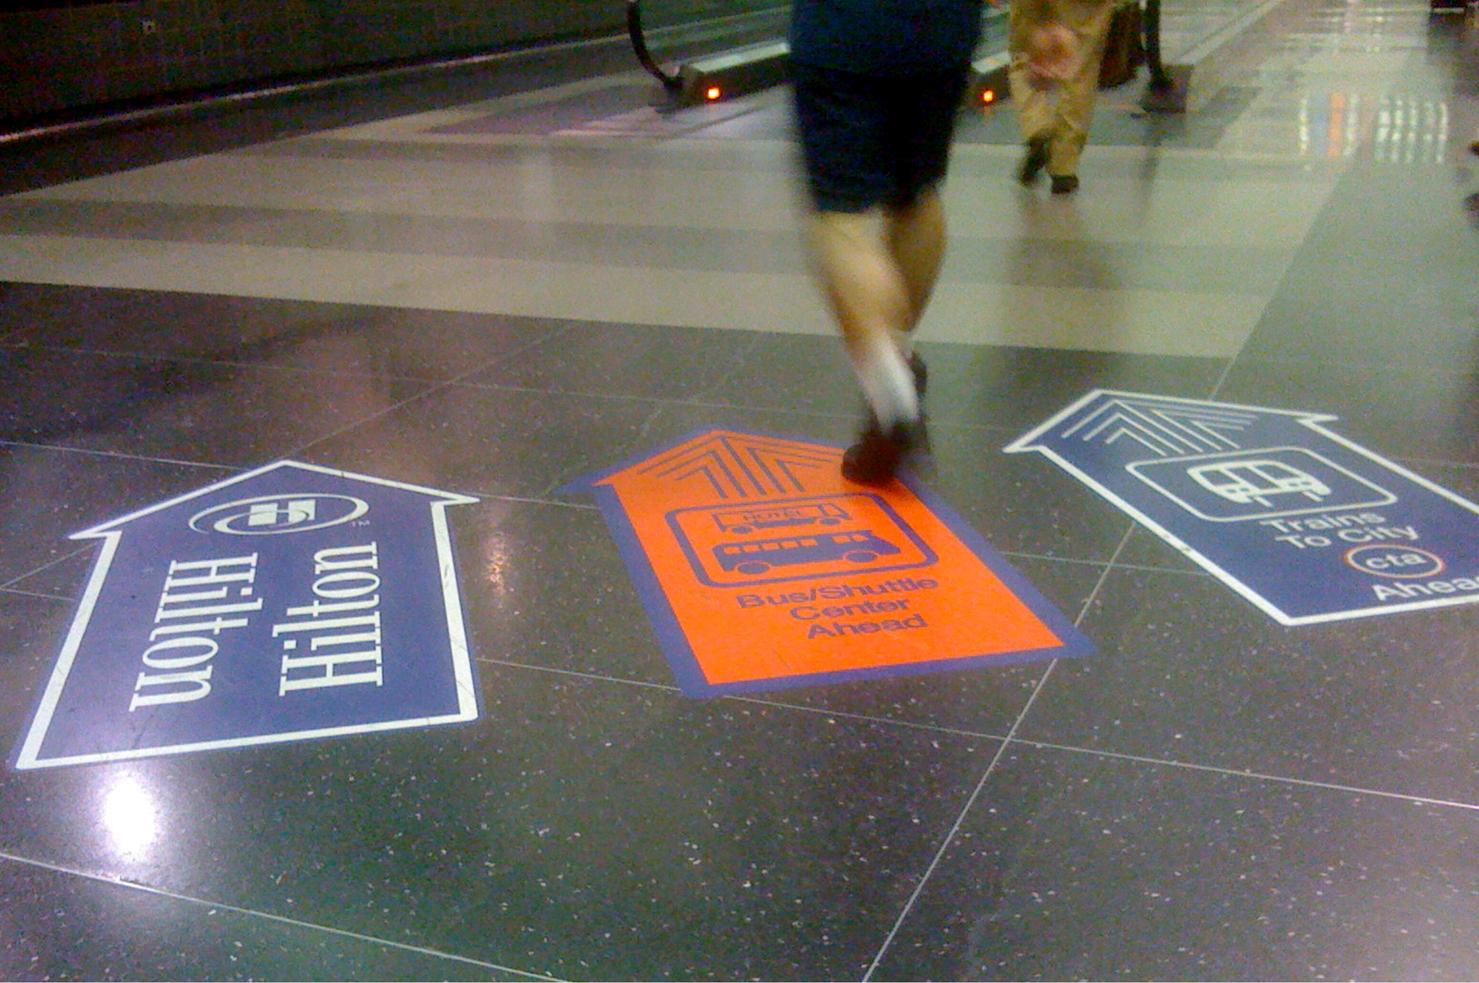 Wayfinding on the floor for On the floor on the floor